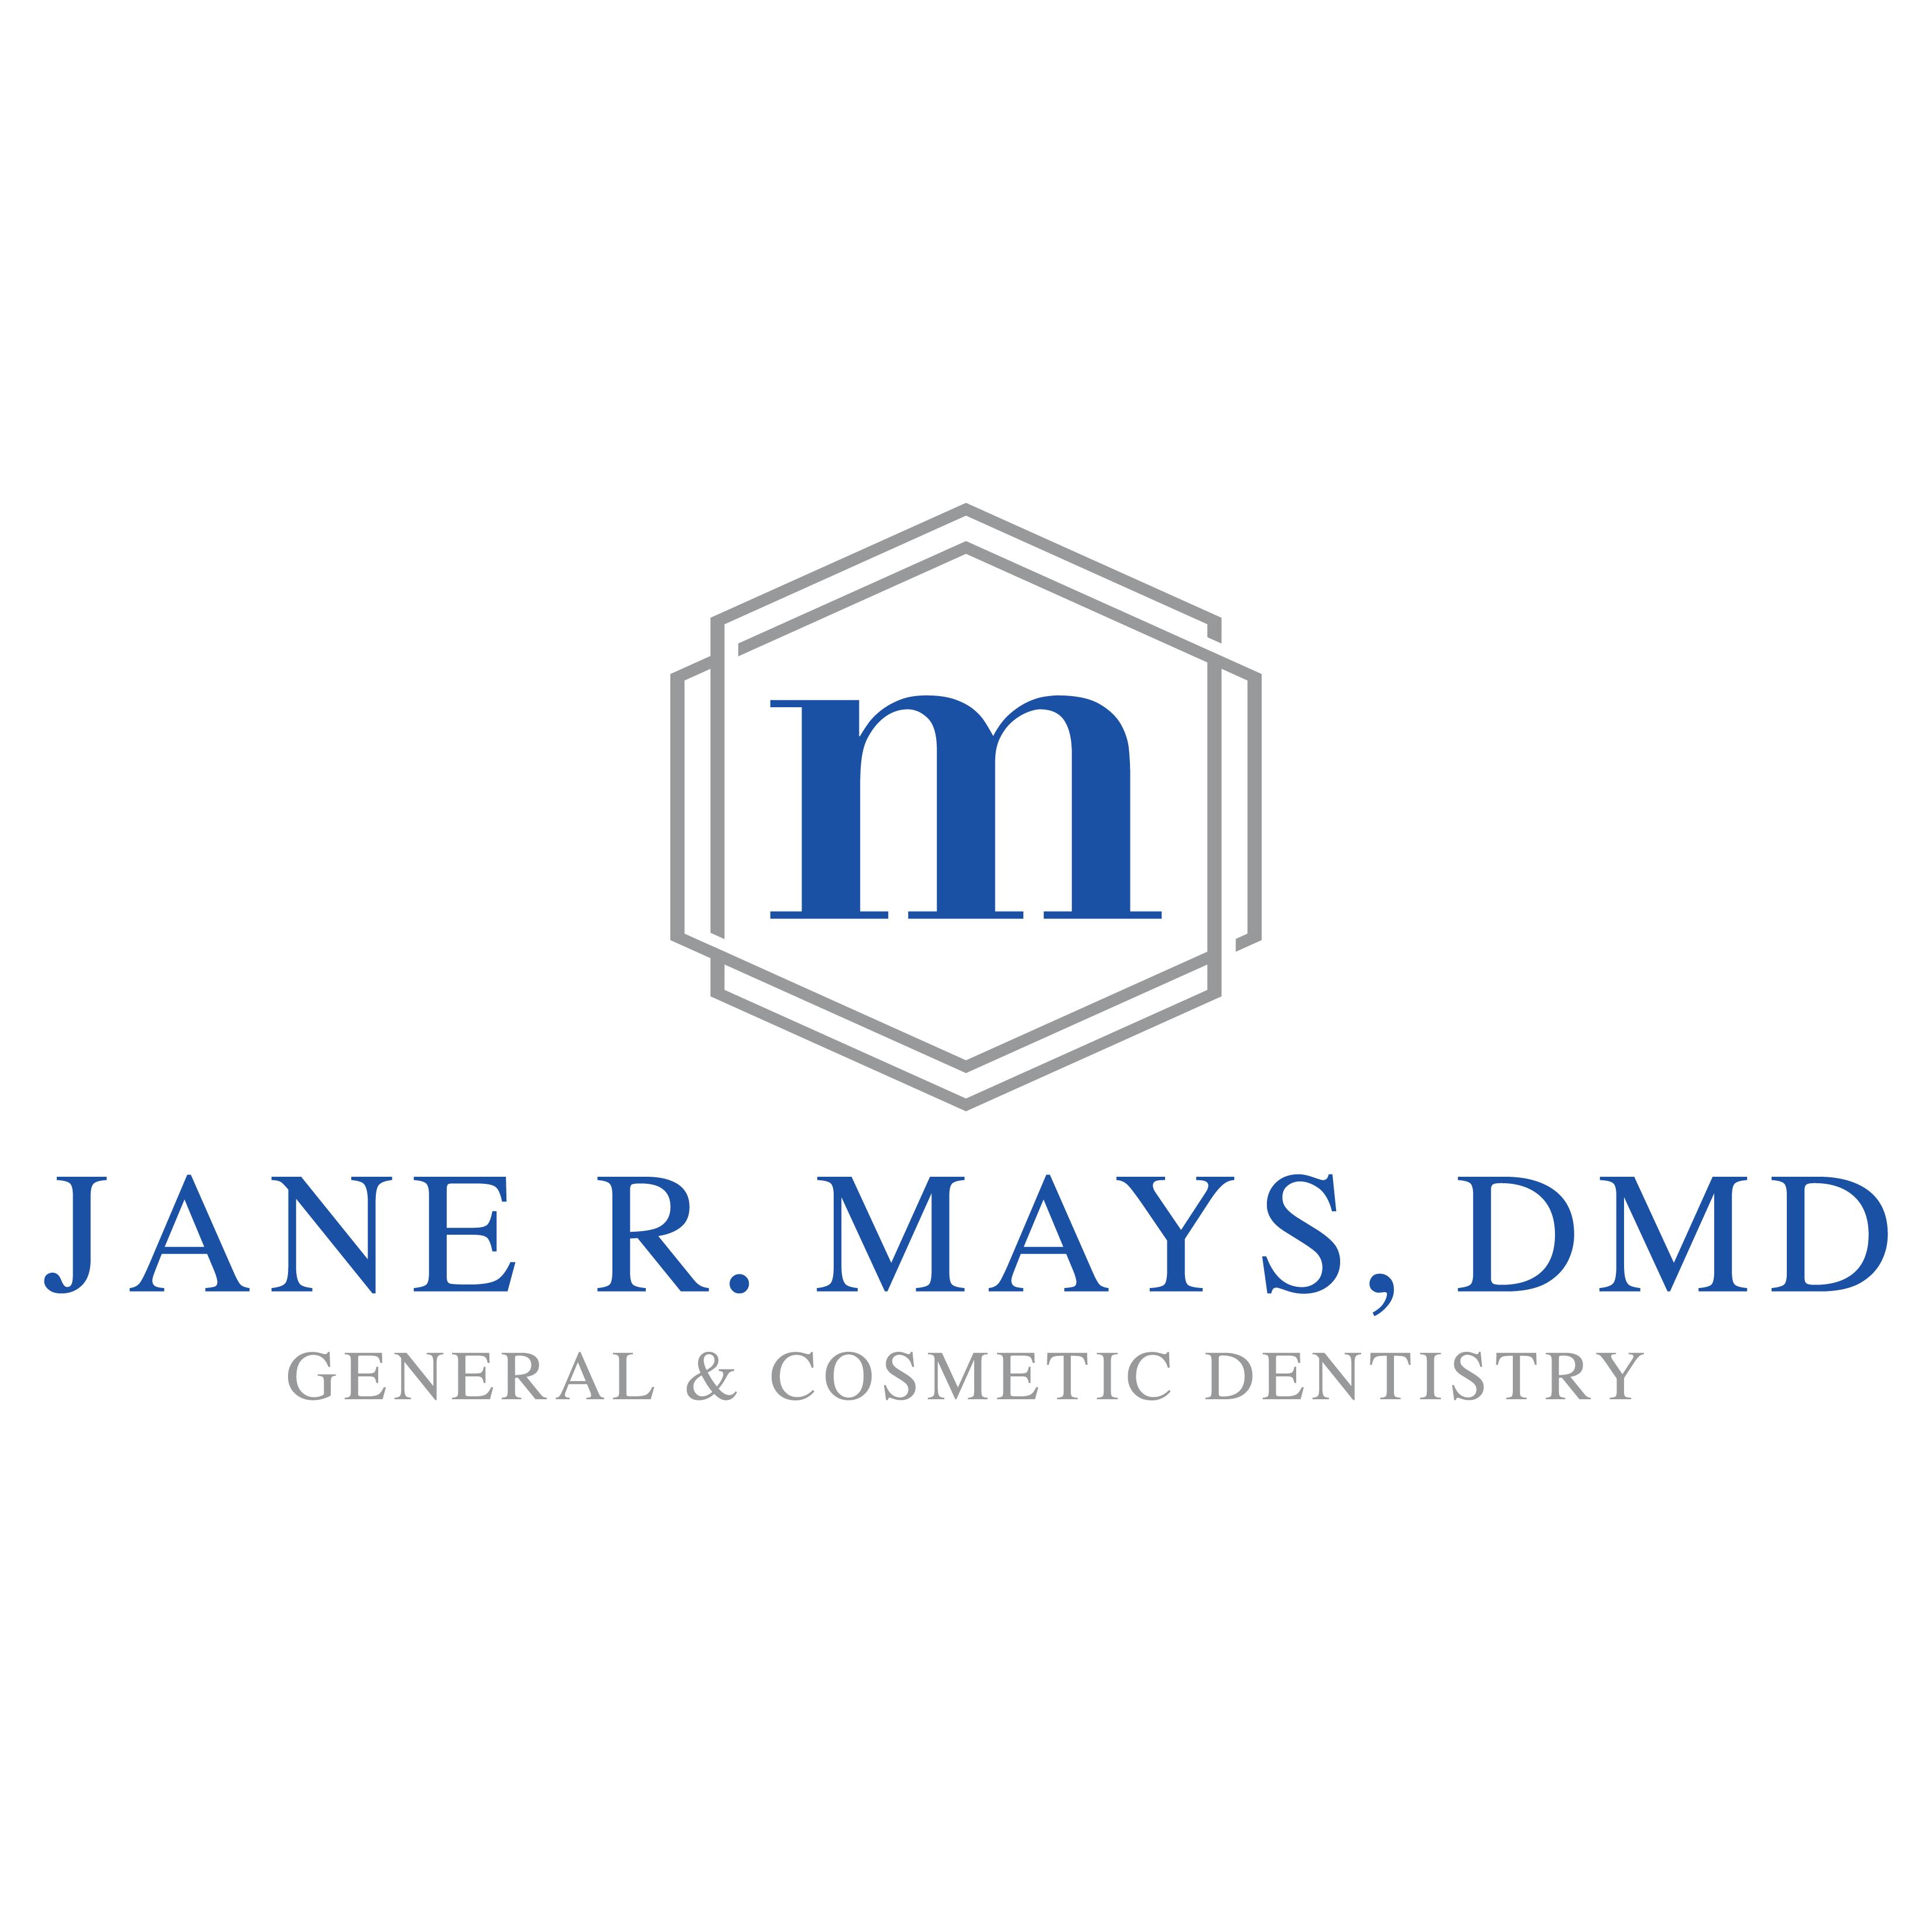 Jane R. Mays, D.M.D